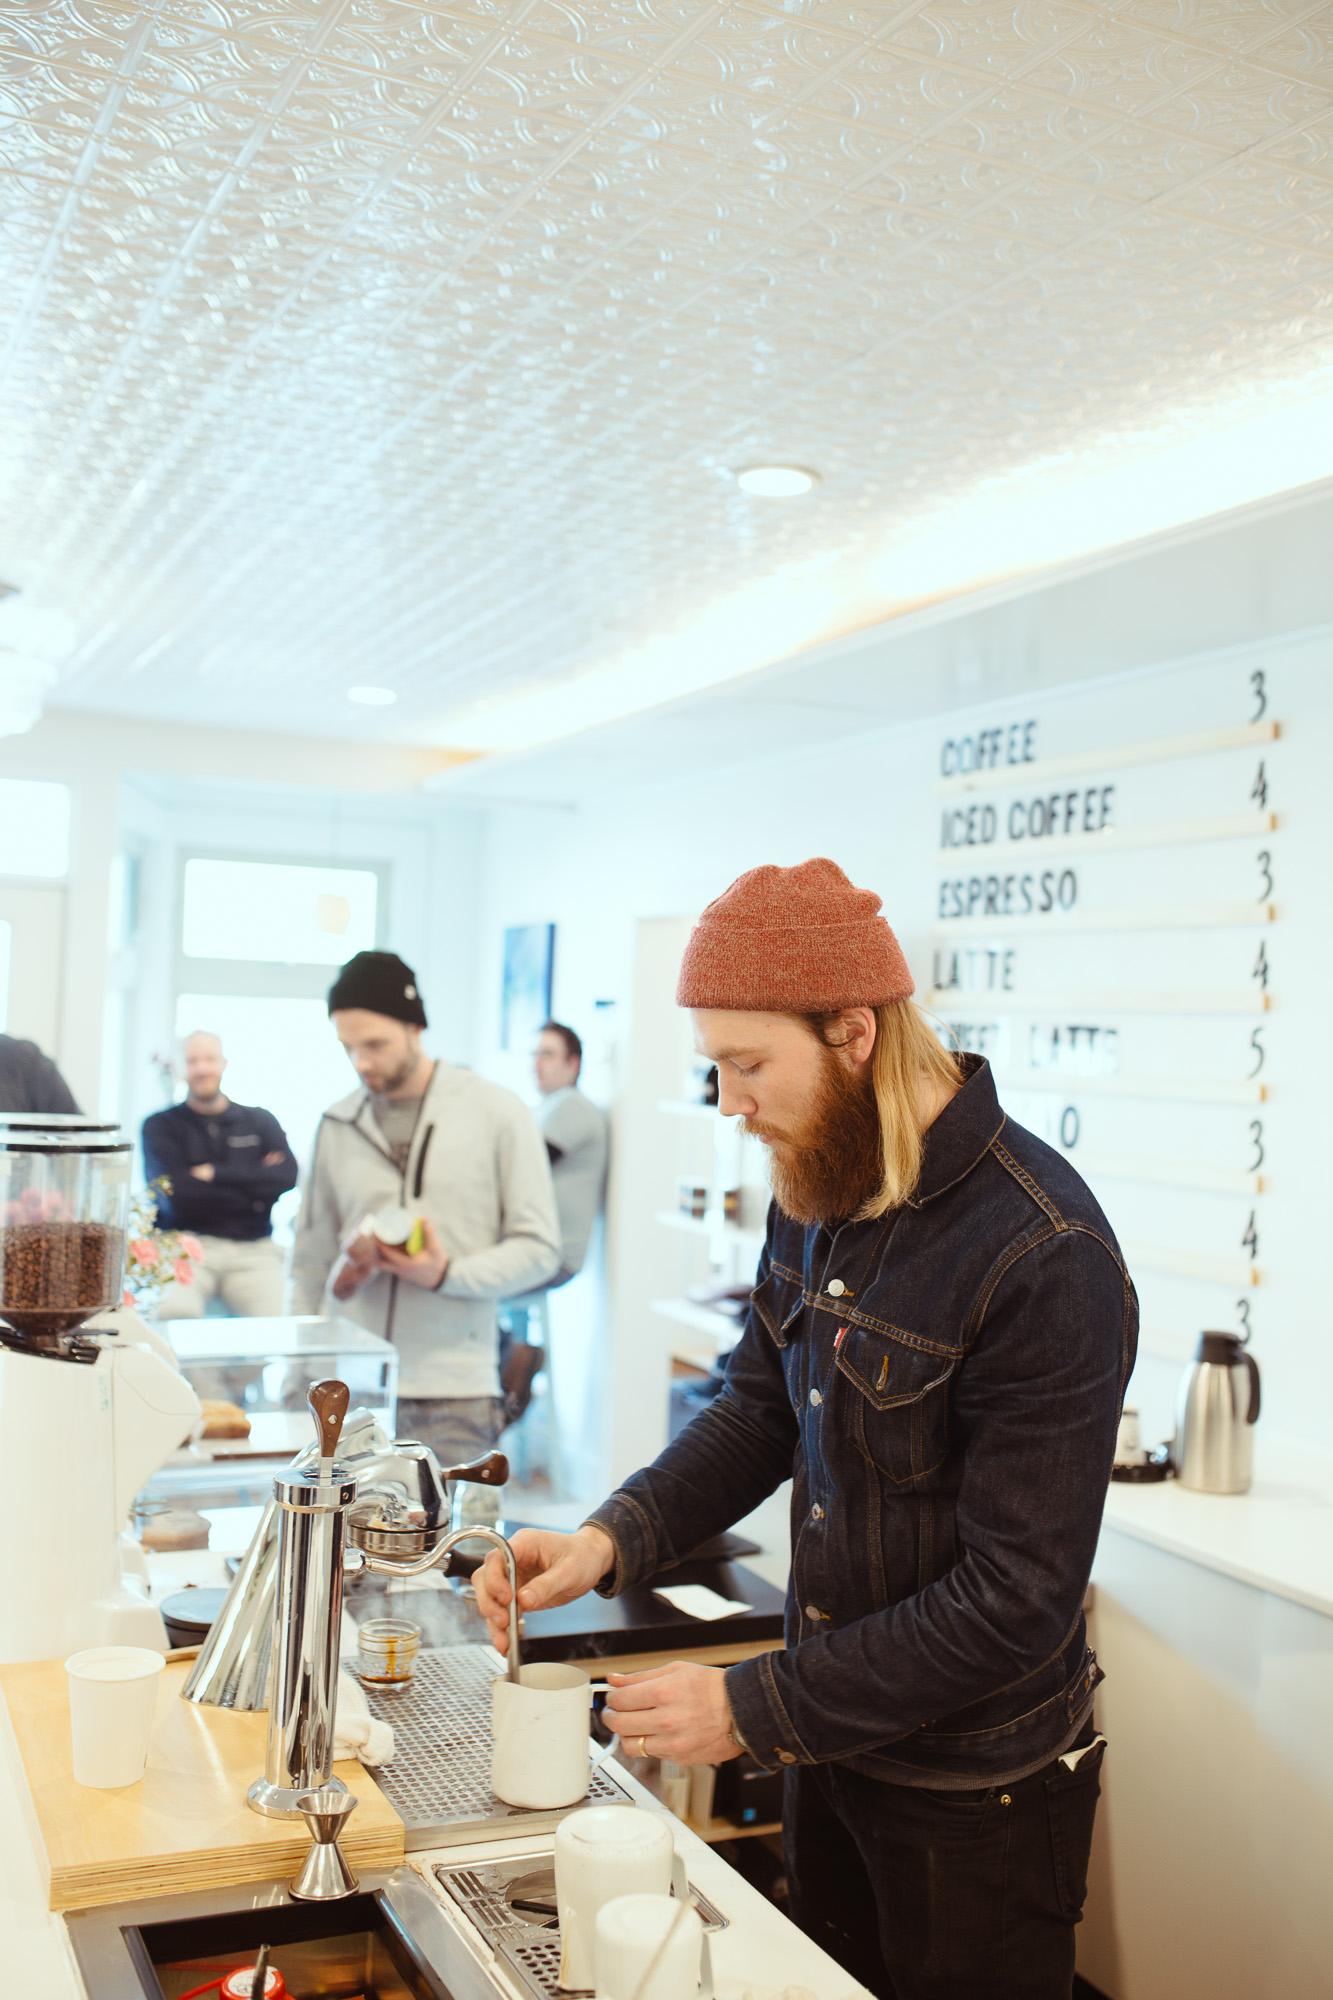 Man behind coffee bar